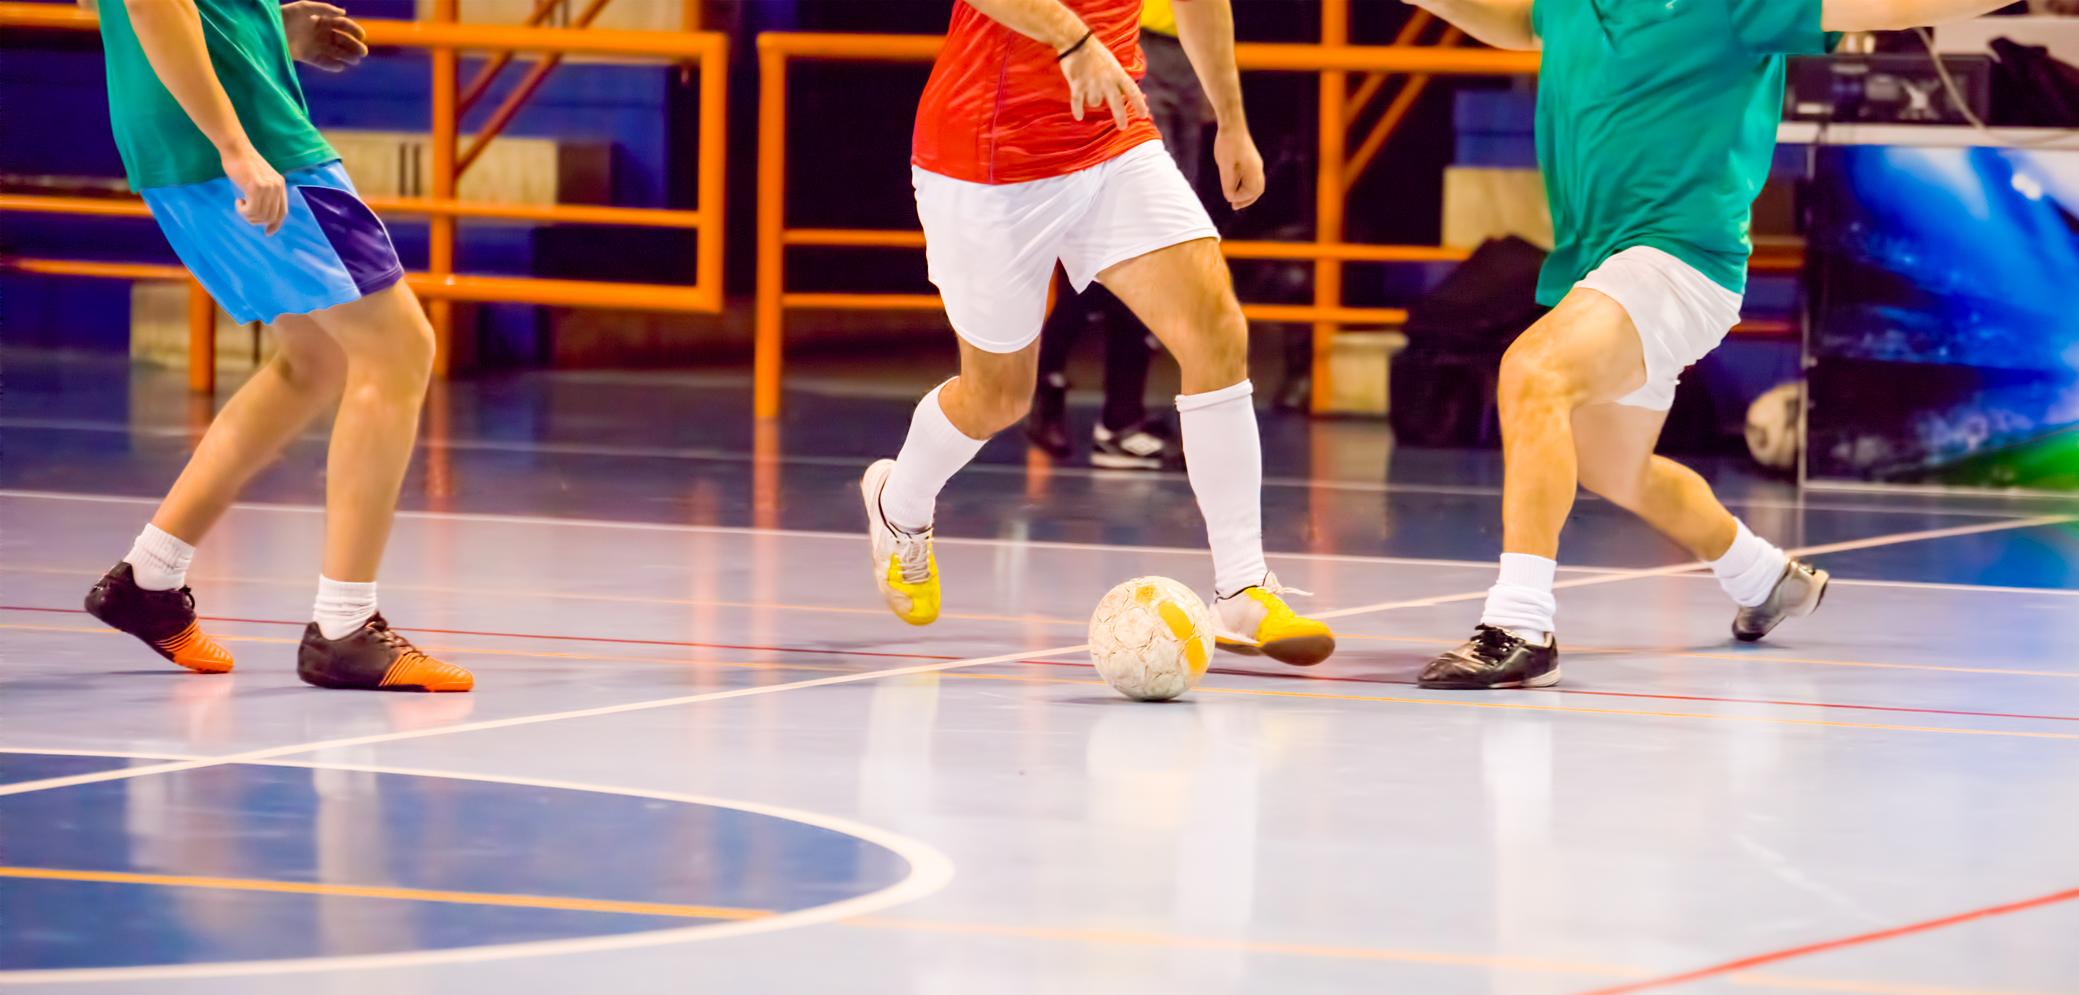 já-pensou-em-praticar-futsal-1